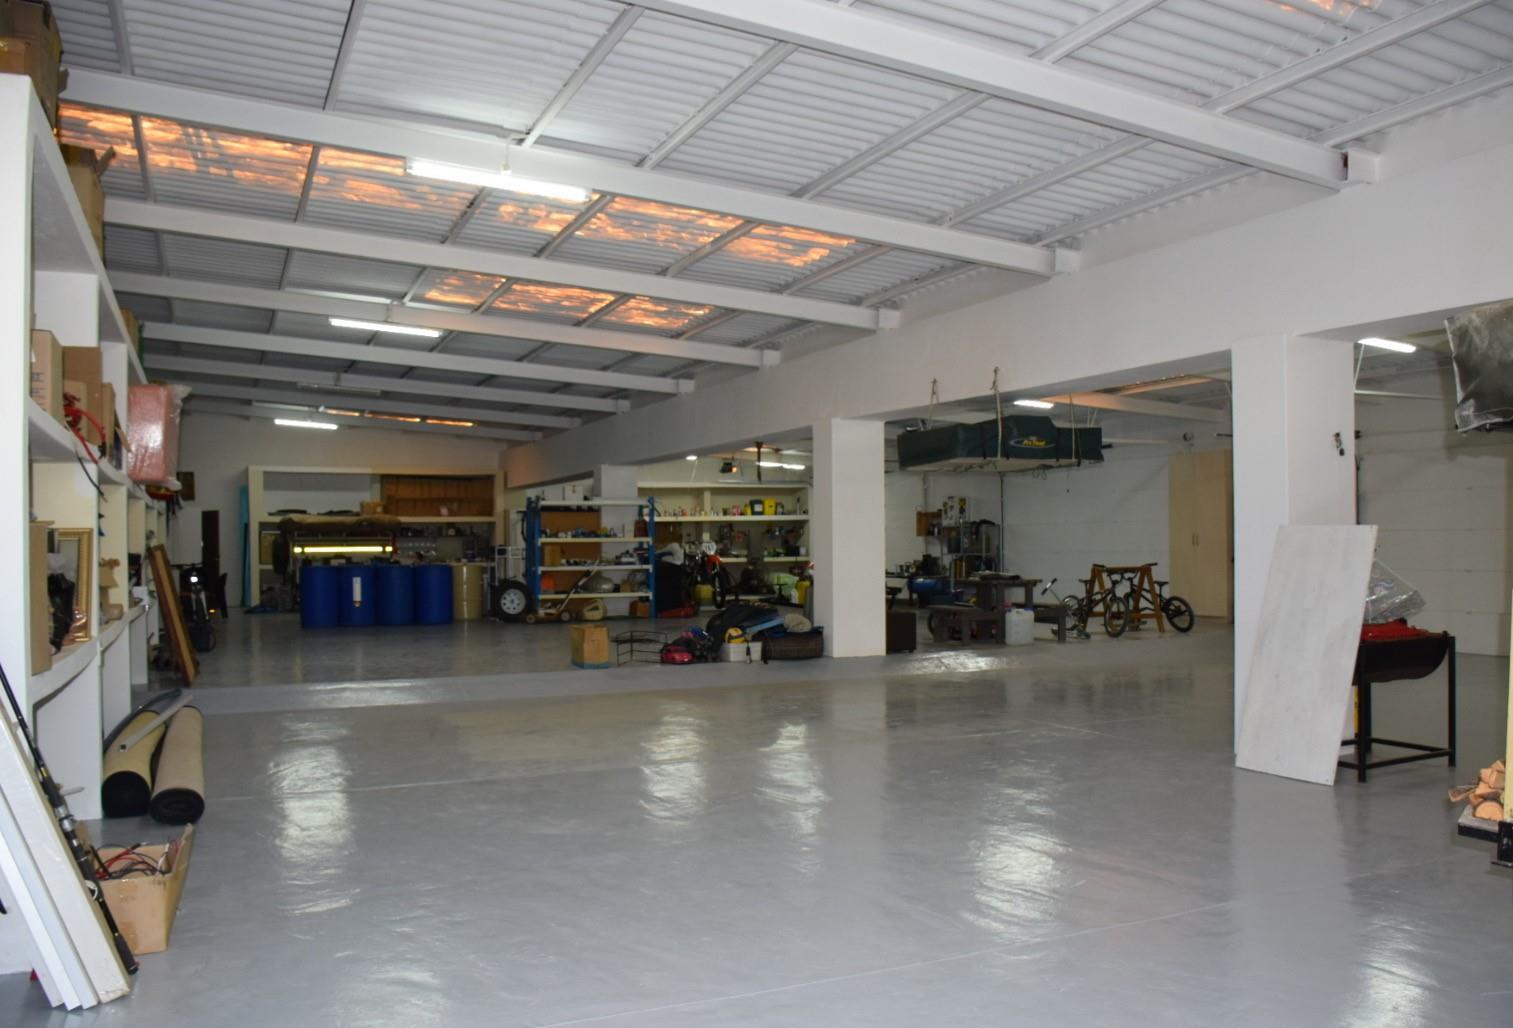 Huge garage space